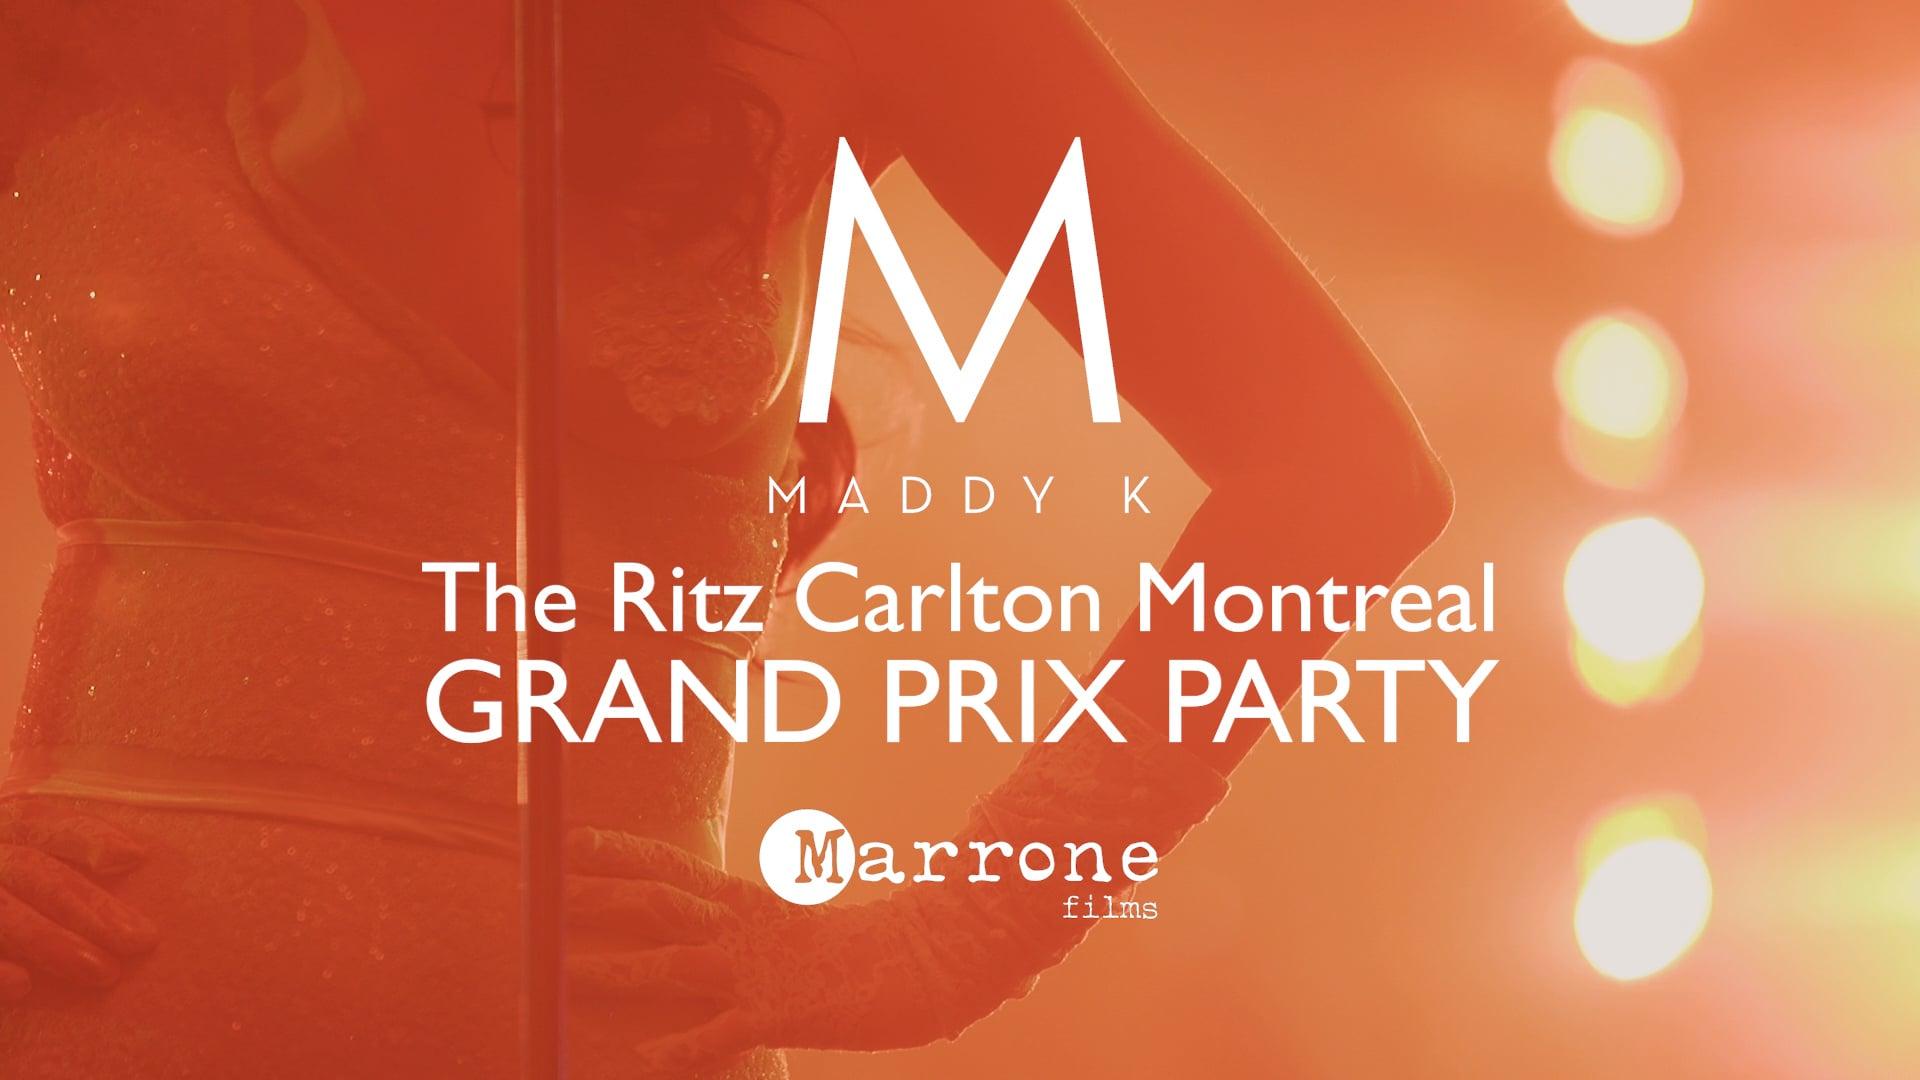 The Ritz Carlton Montreal's Grand Prix Party